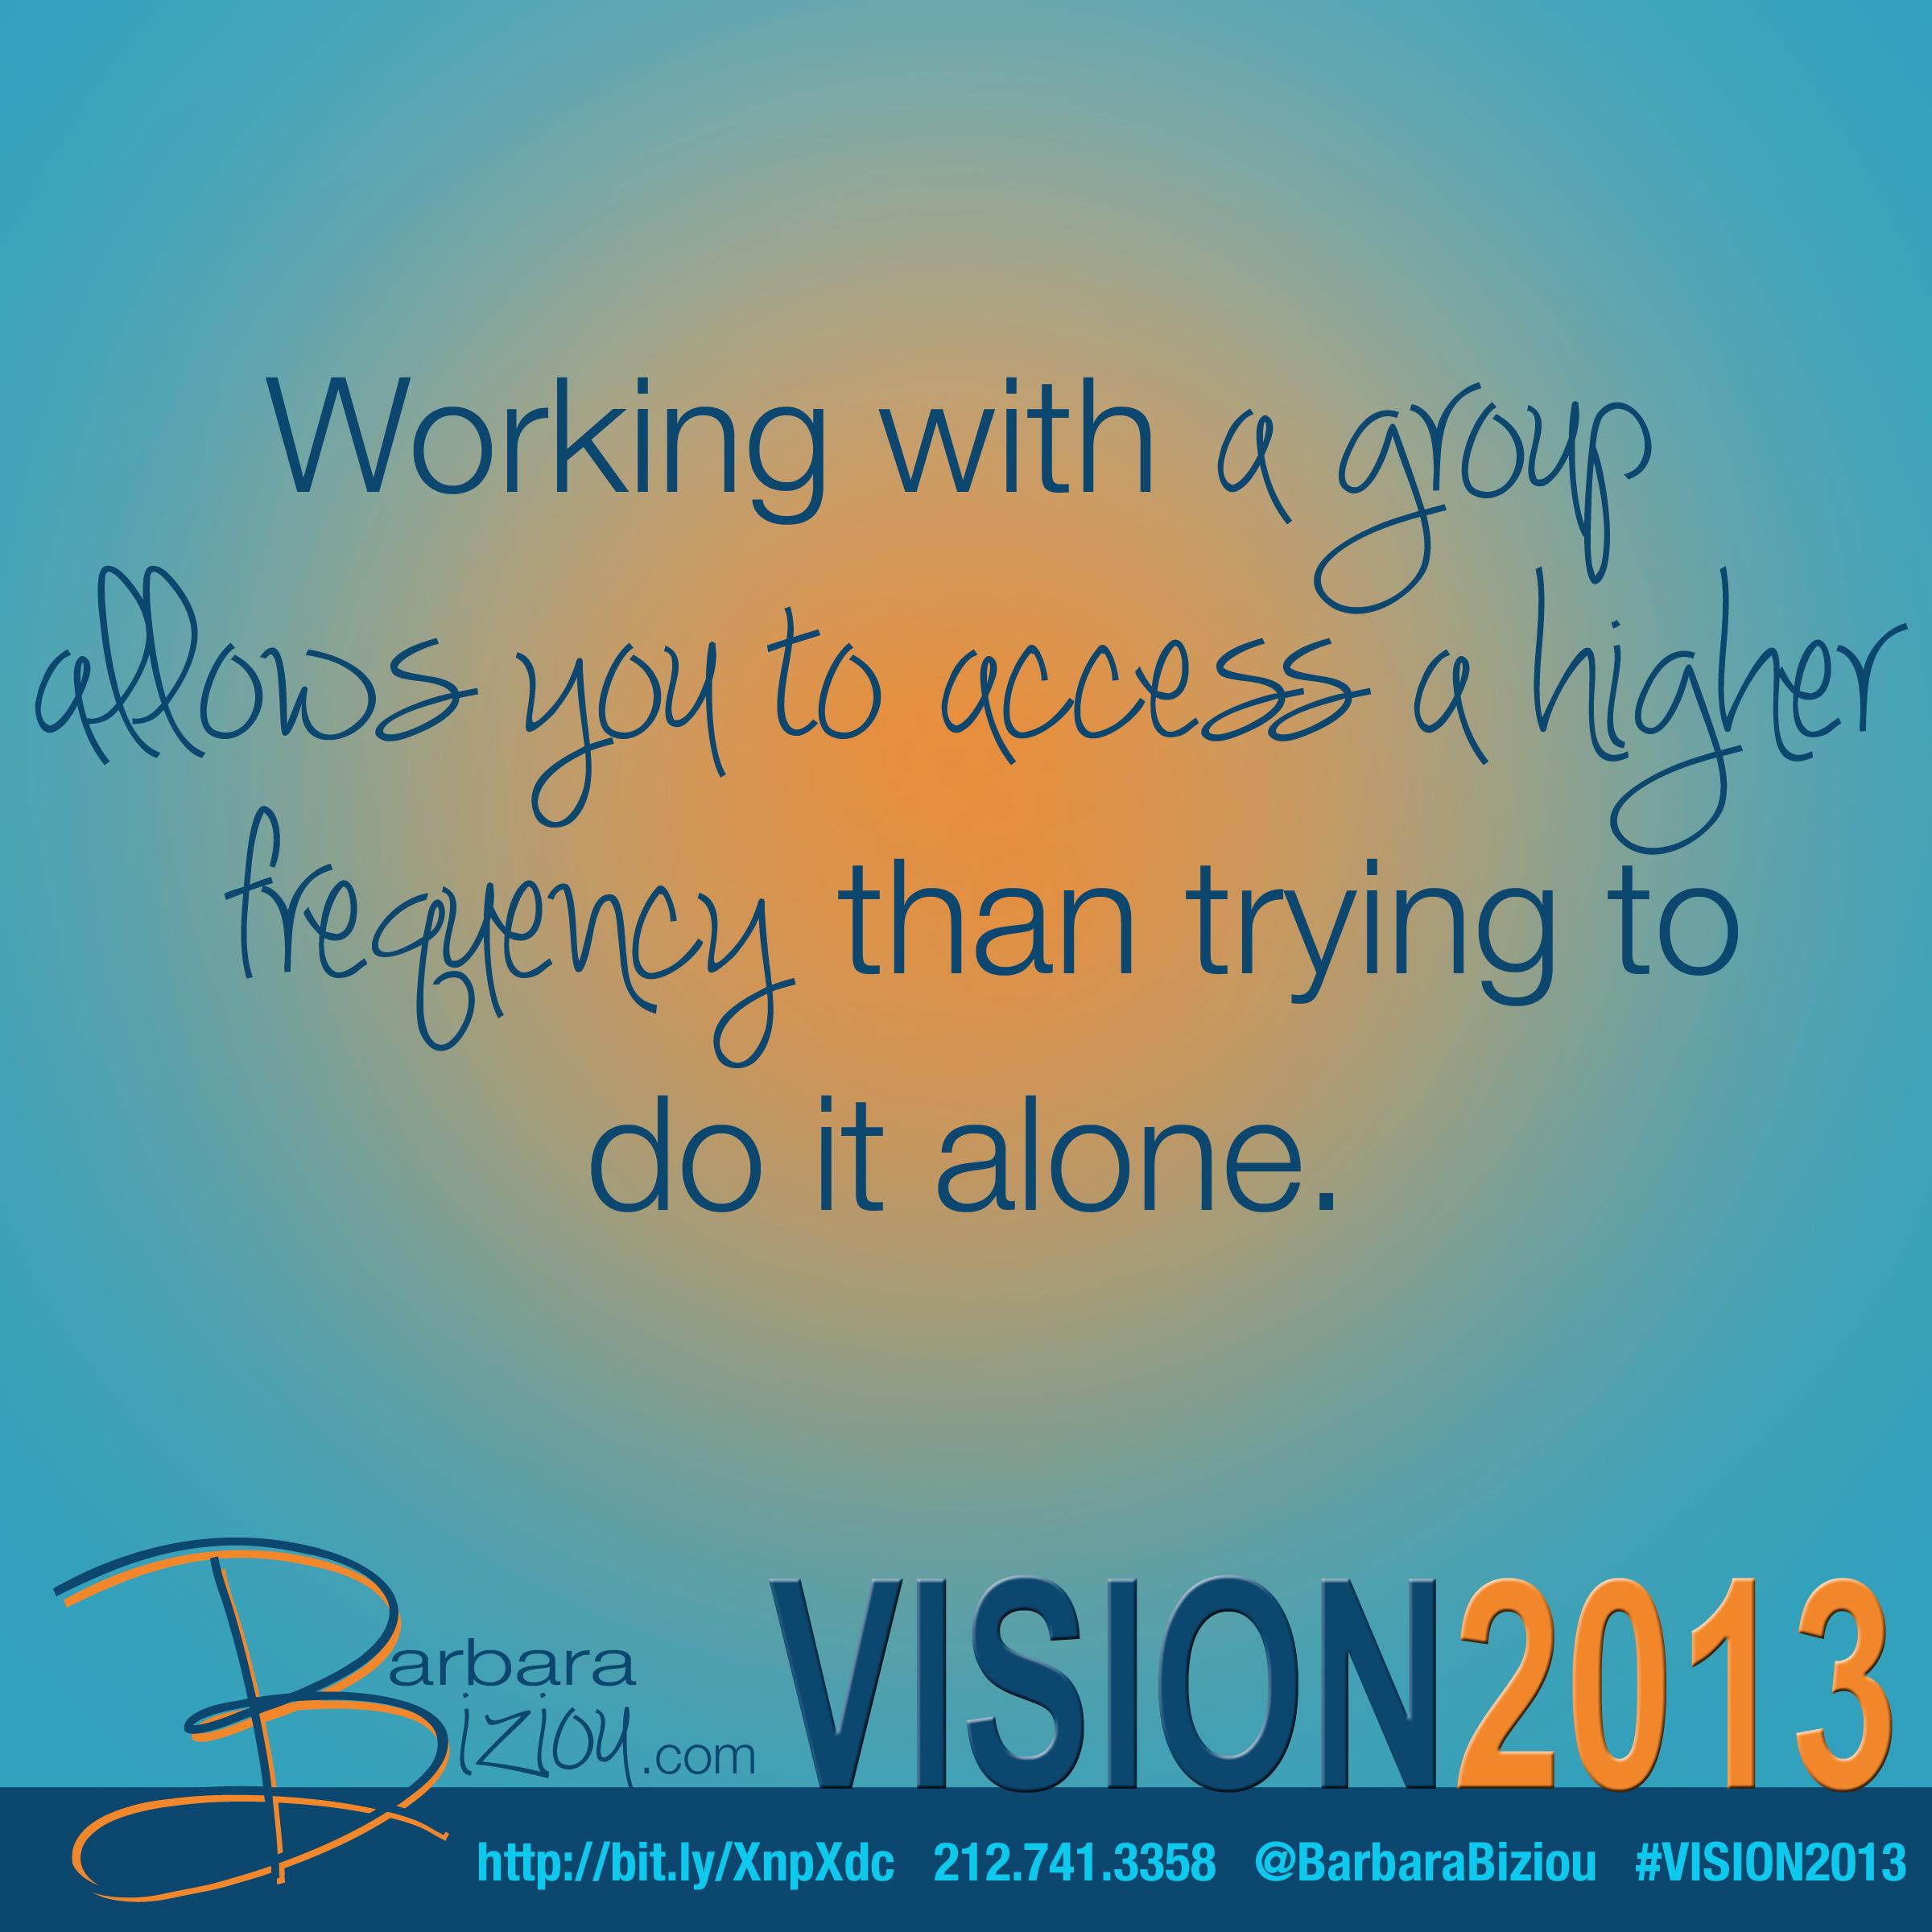 Vision 2013 Pinterest ad 3.jpg